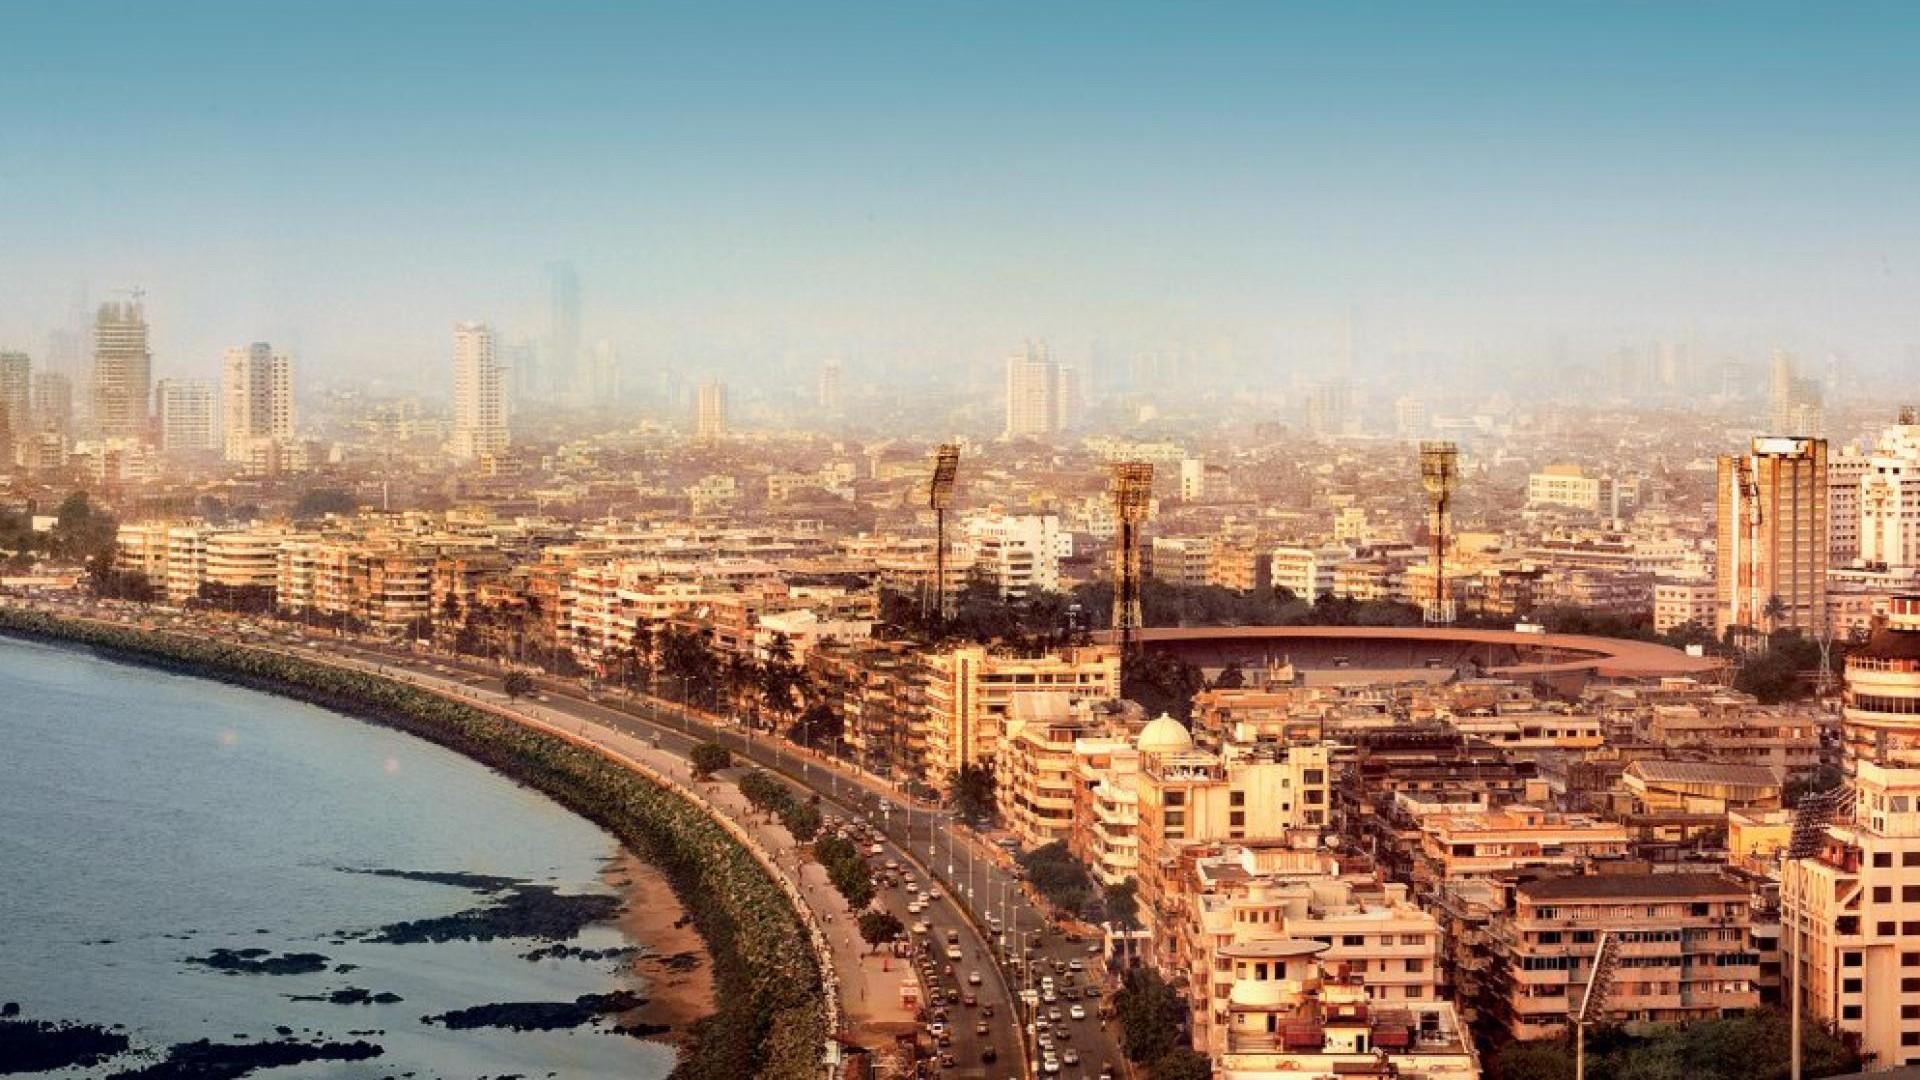 city of mumbai bombay essay From london to mumbai and back again: gentrification and public policy in comparative perspective  transforming mumbai into a world-class city bombay first, mumbai.